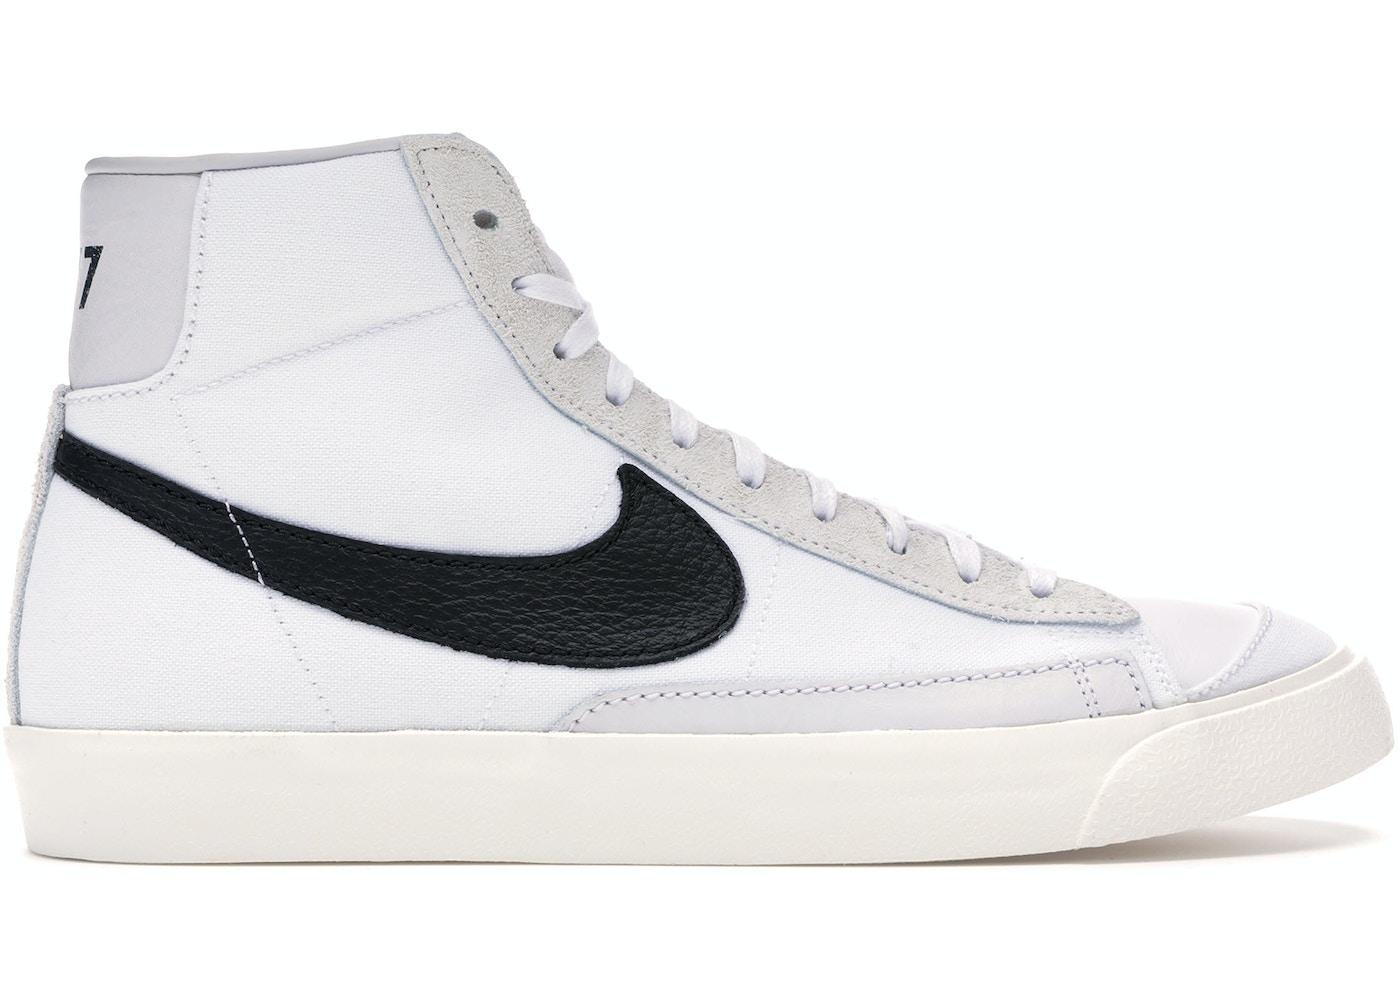 d41e9f55c HypeAnalyzer · Nike Blazer Mid 77 Vintage Slam Jam